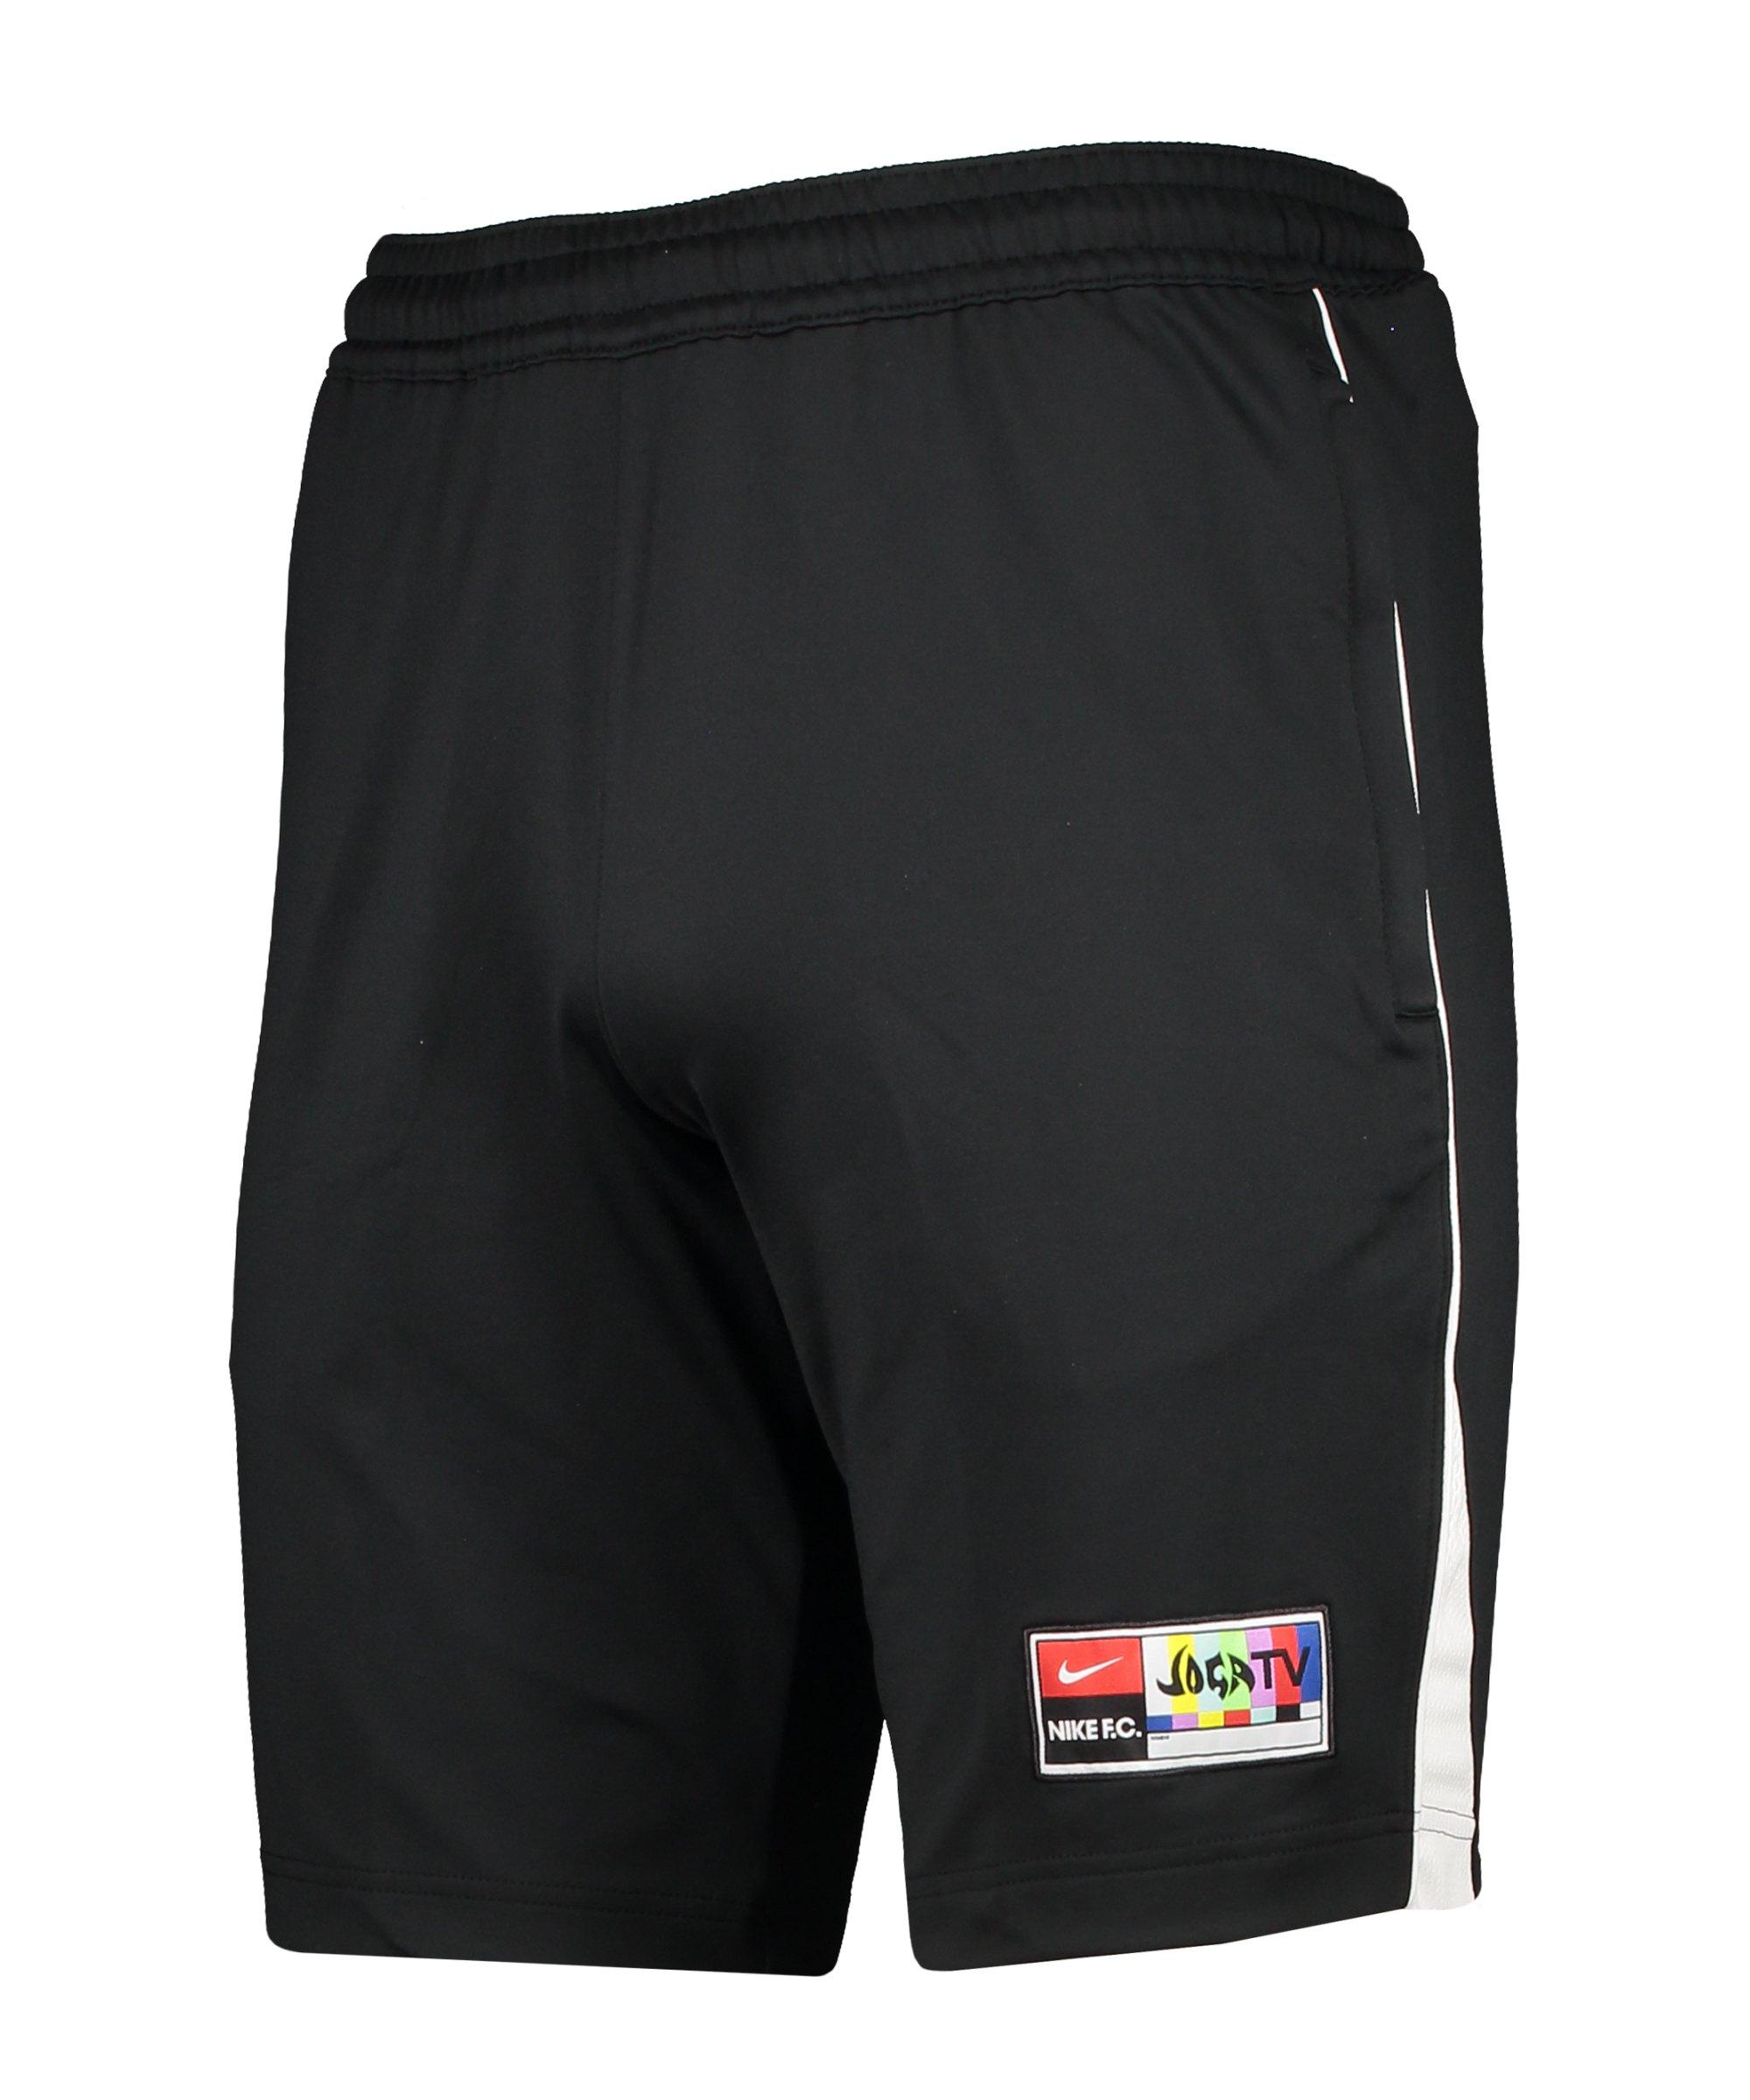 Nike F.C. Joga Bonito Short Schwarz F011 - schwarz